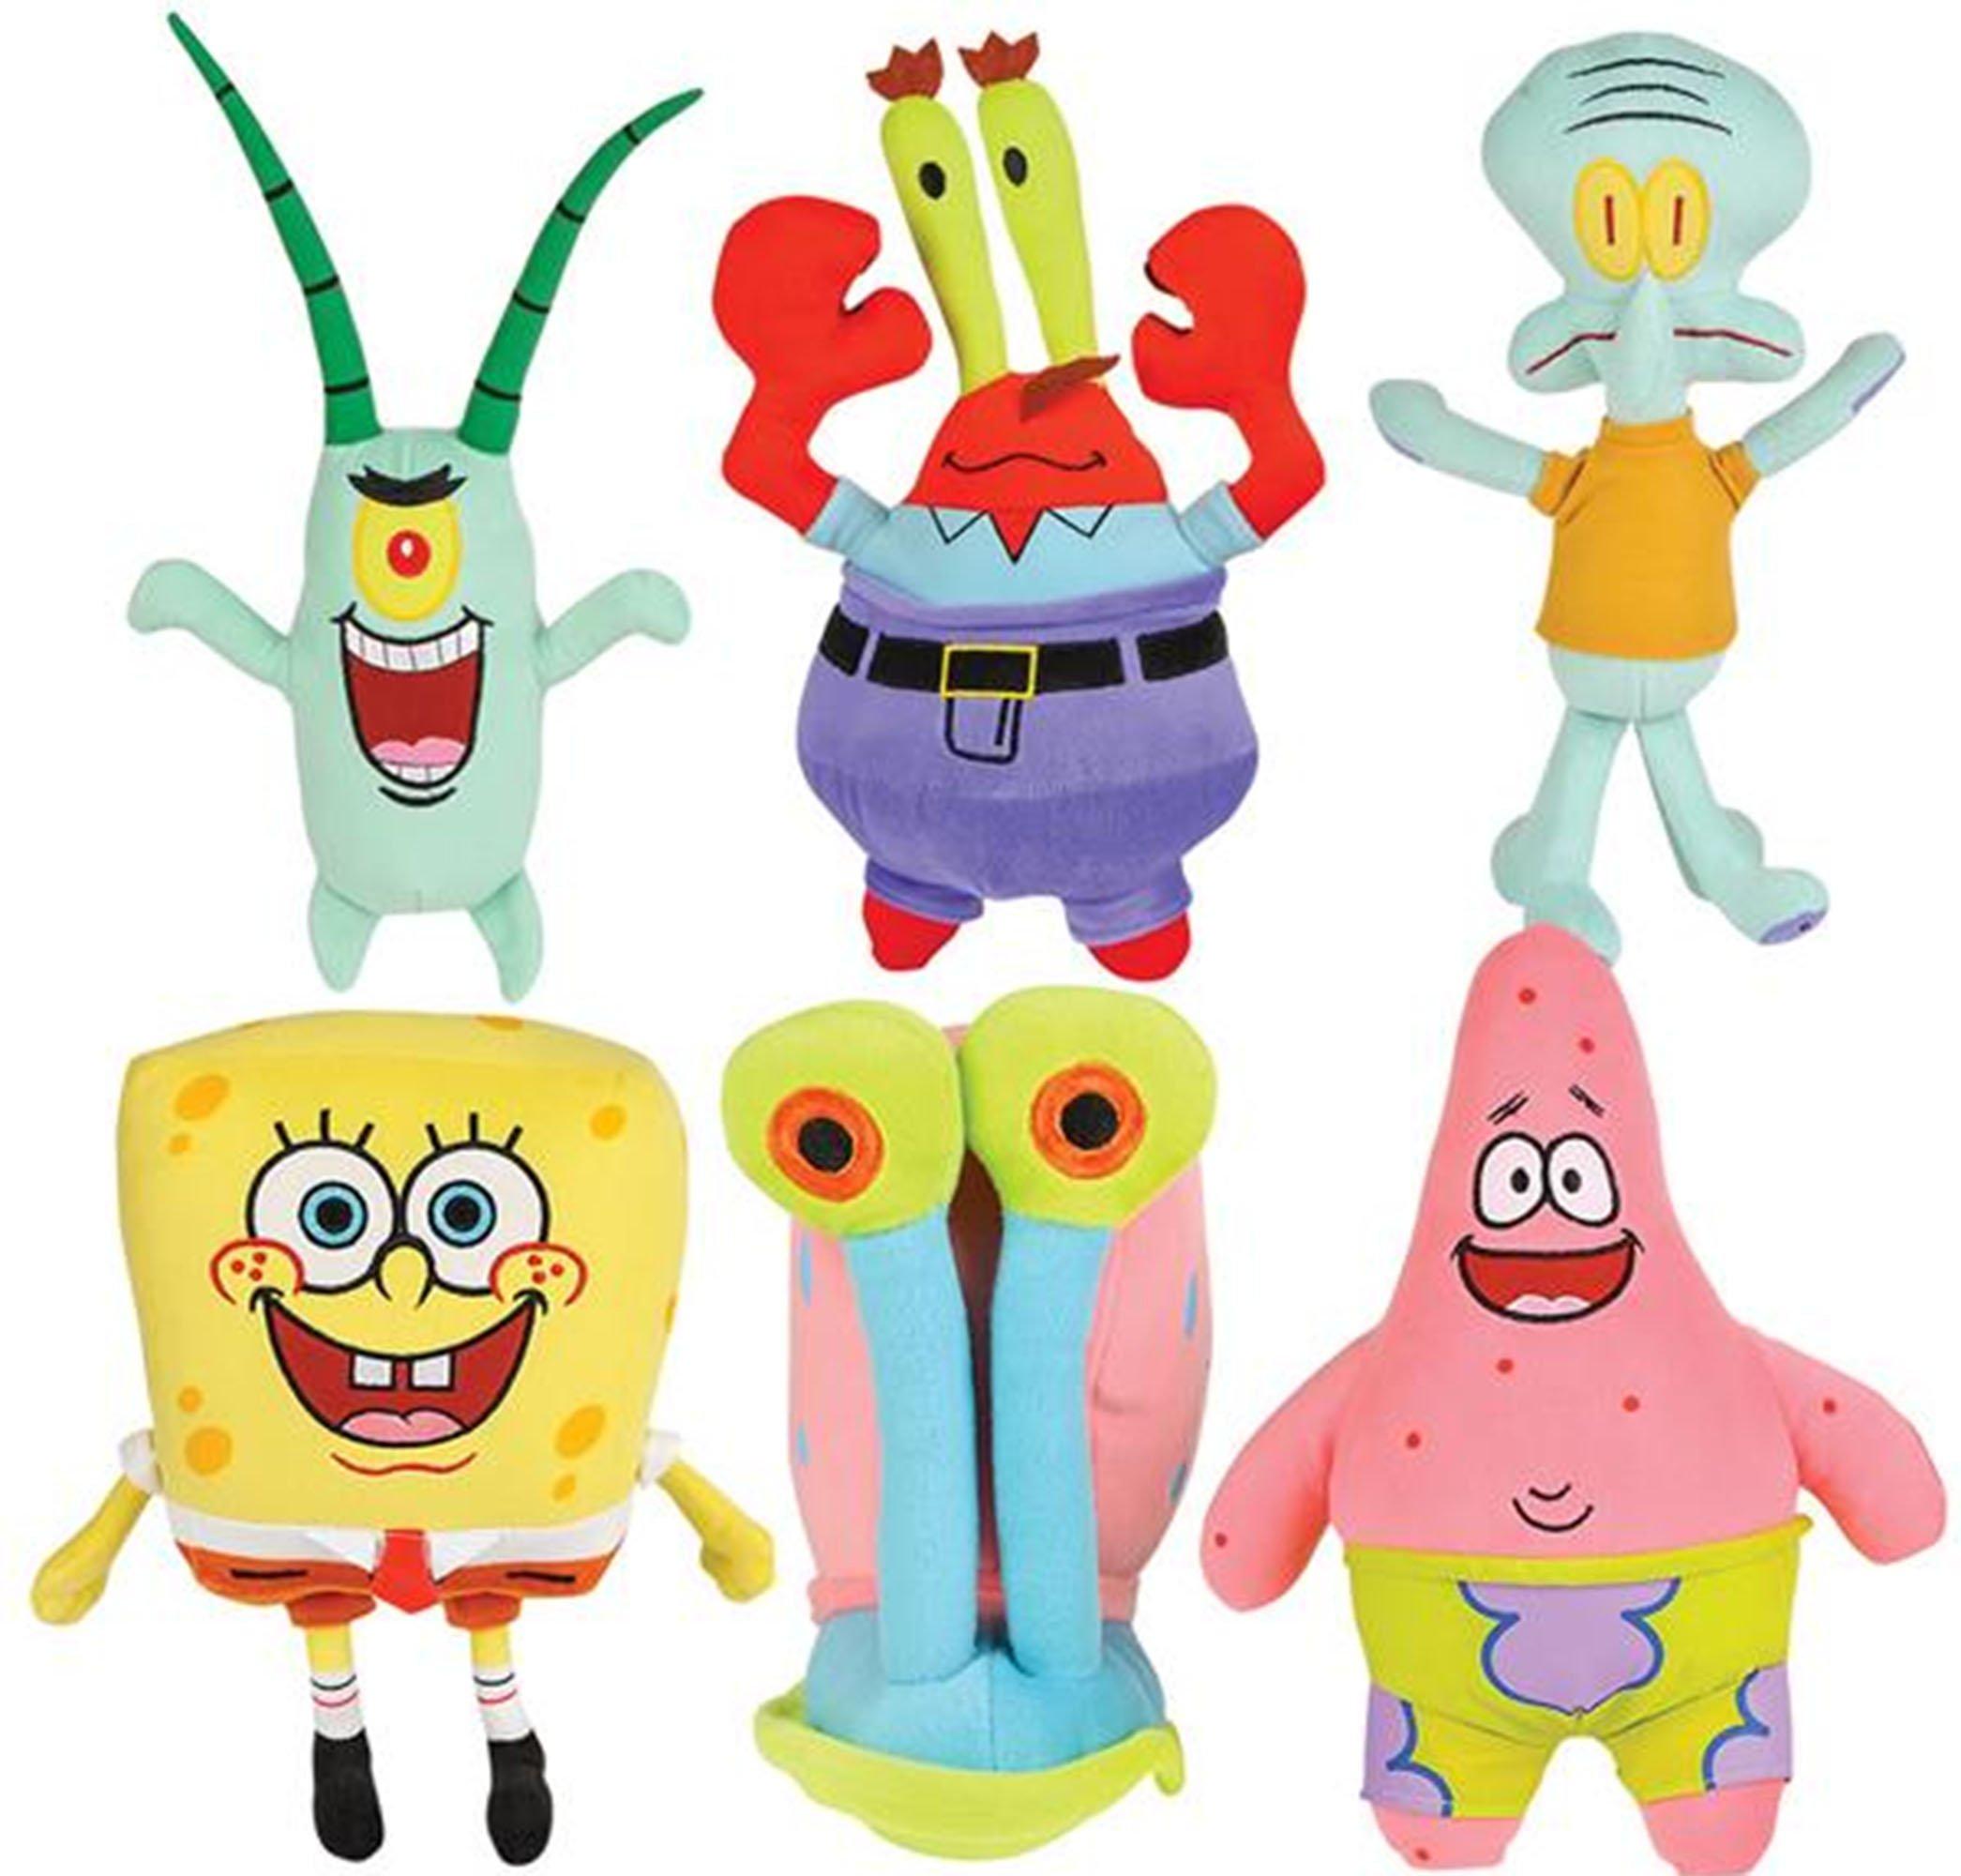 ROCKYMART LOT of 6 - Spongebob Character Licensed Plush Toys12.5 Tall rm5060 by ROCKYMART